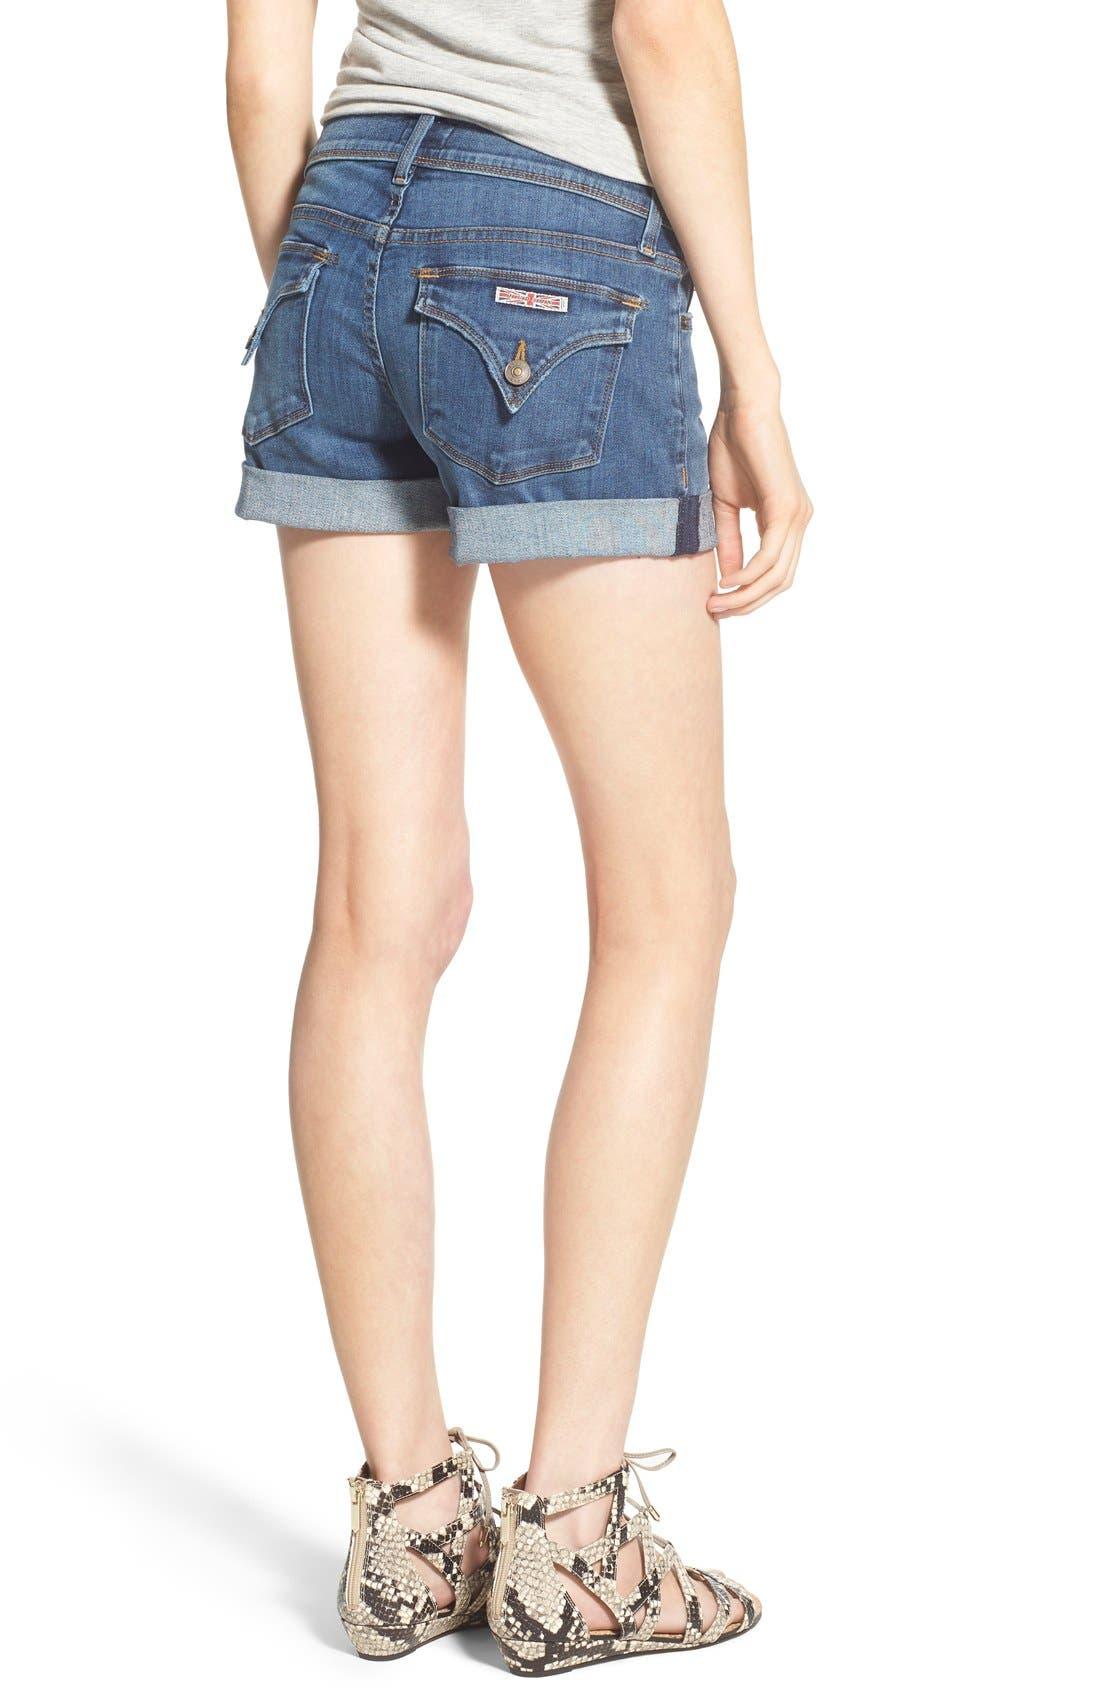 Alternate Image 2  - Hudson Jeans 'Croxley' Cuffed Denim Shorts (Advantageous)